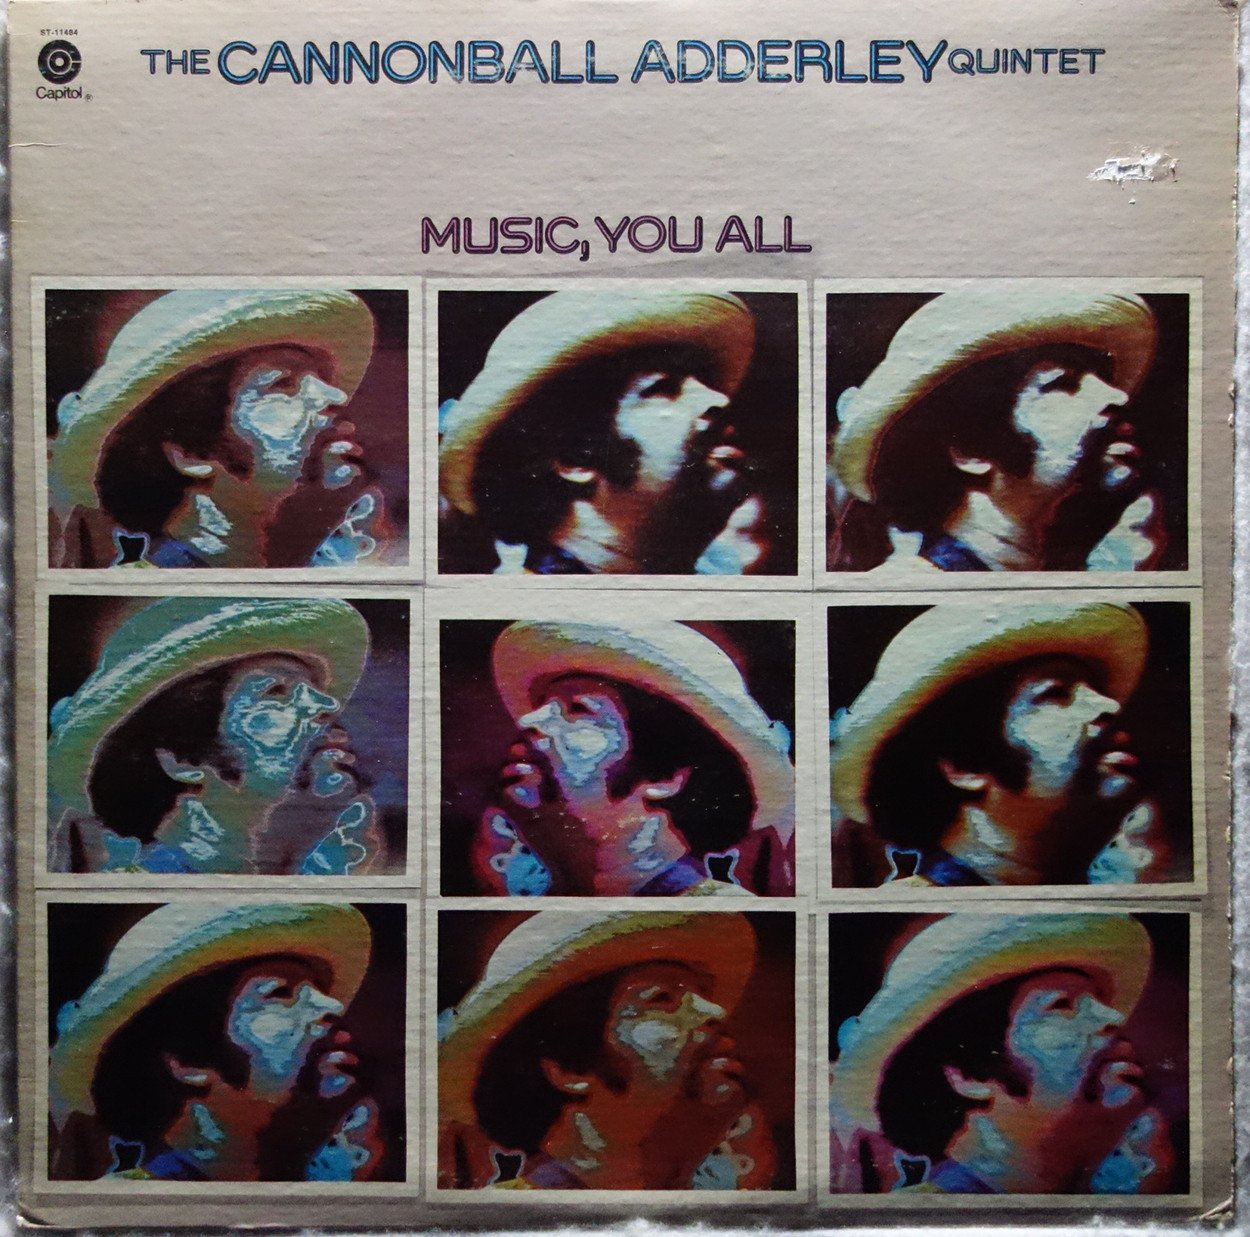 the cannonball adderley quintet music you all vinylian